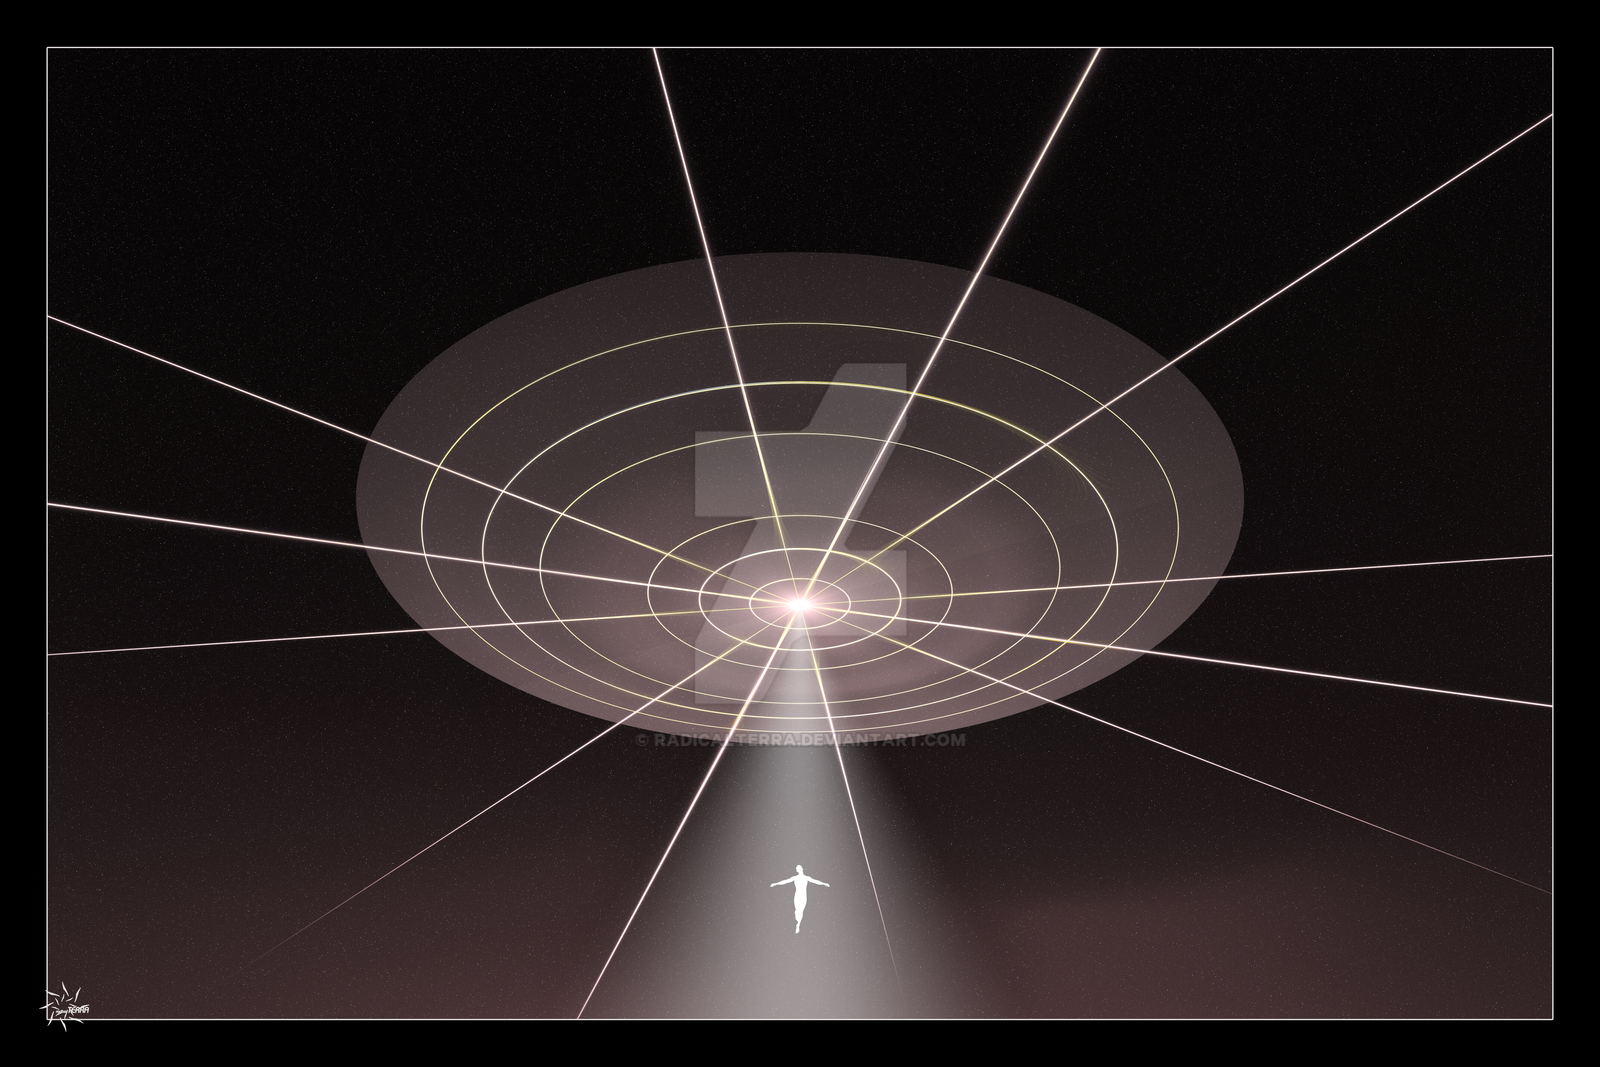 Astral Abduction by radicalTERRA